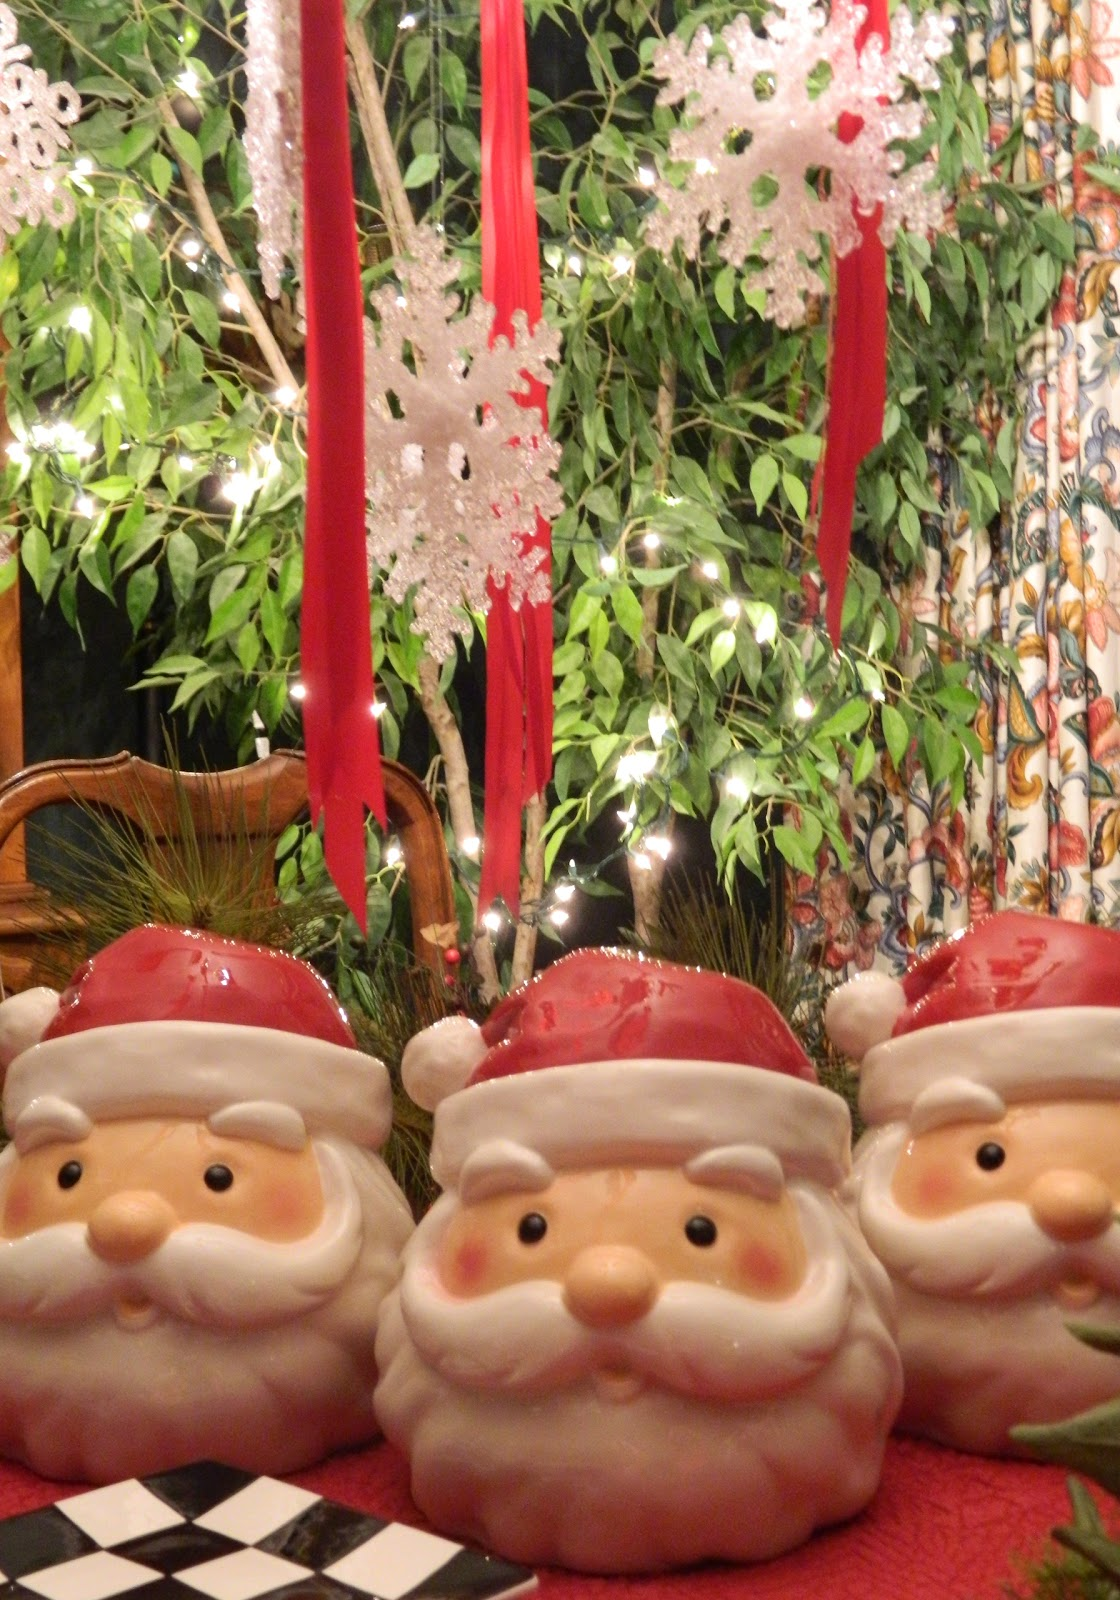 What Happens At Grandma S Grandma S Third Annual Christmas Cookie